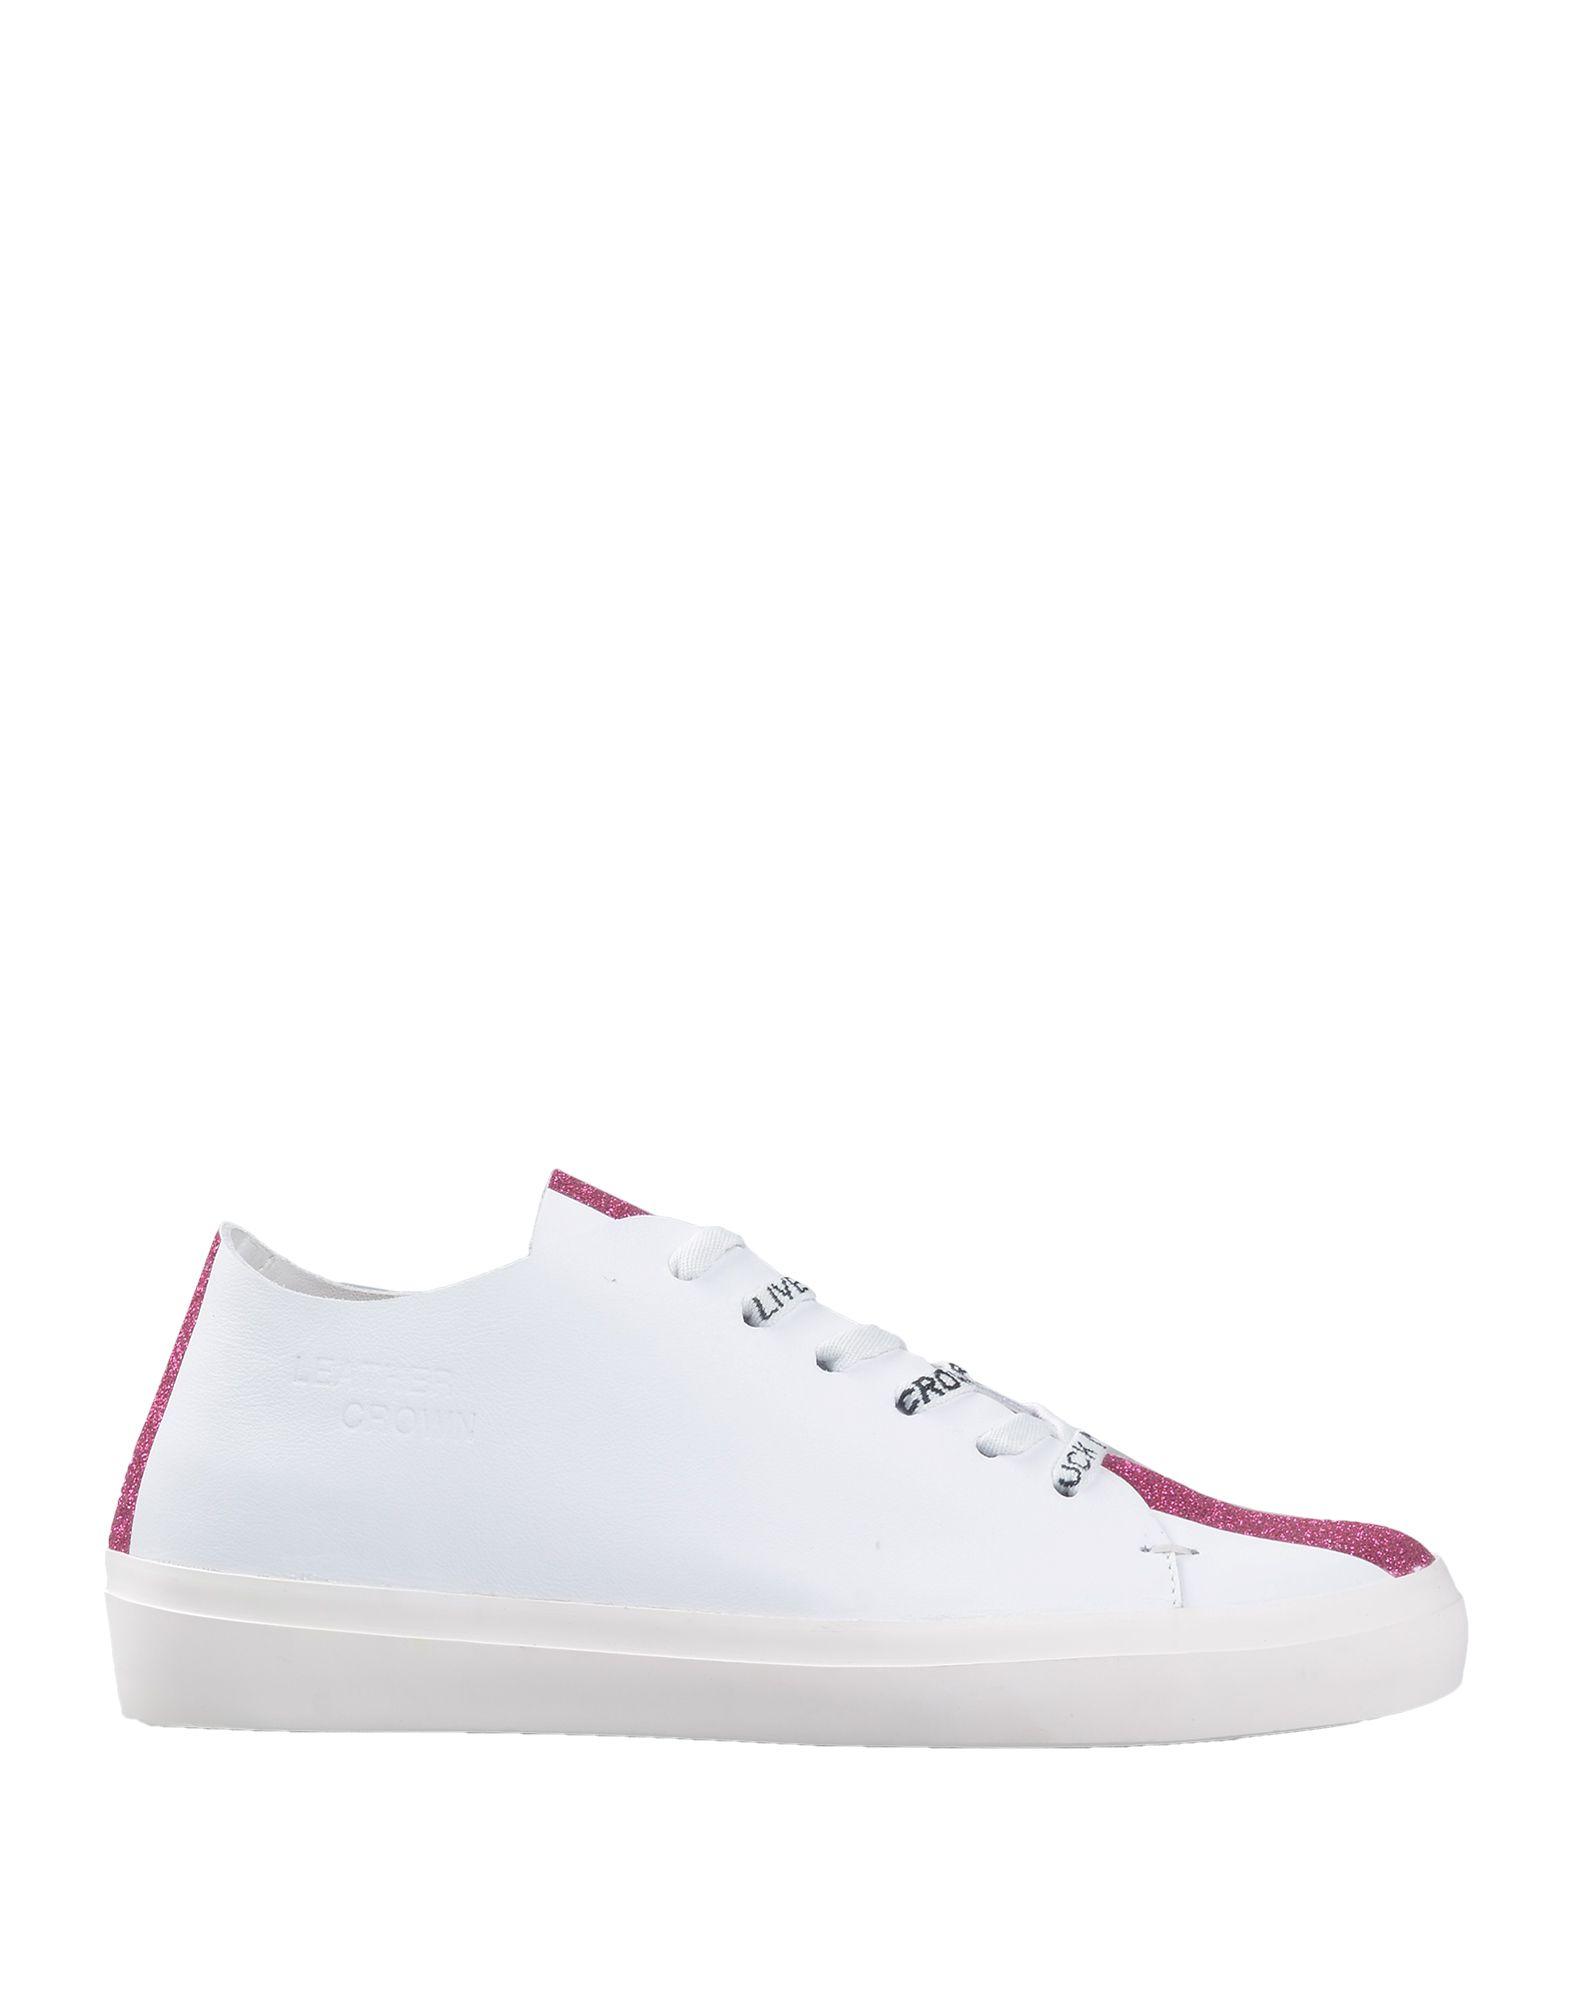 Leder Crown Sneakers Damen Gutes Preis-Leistungs-Verhältnis, es lohnt sich 989